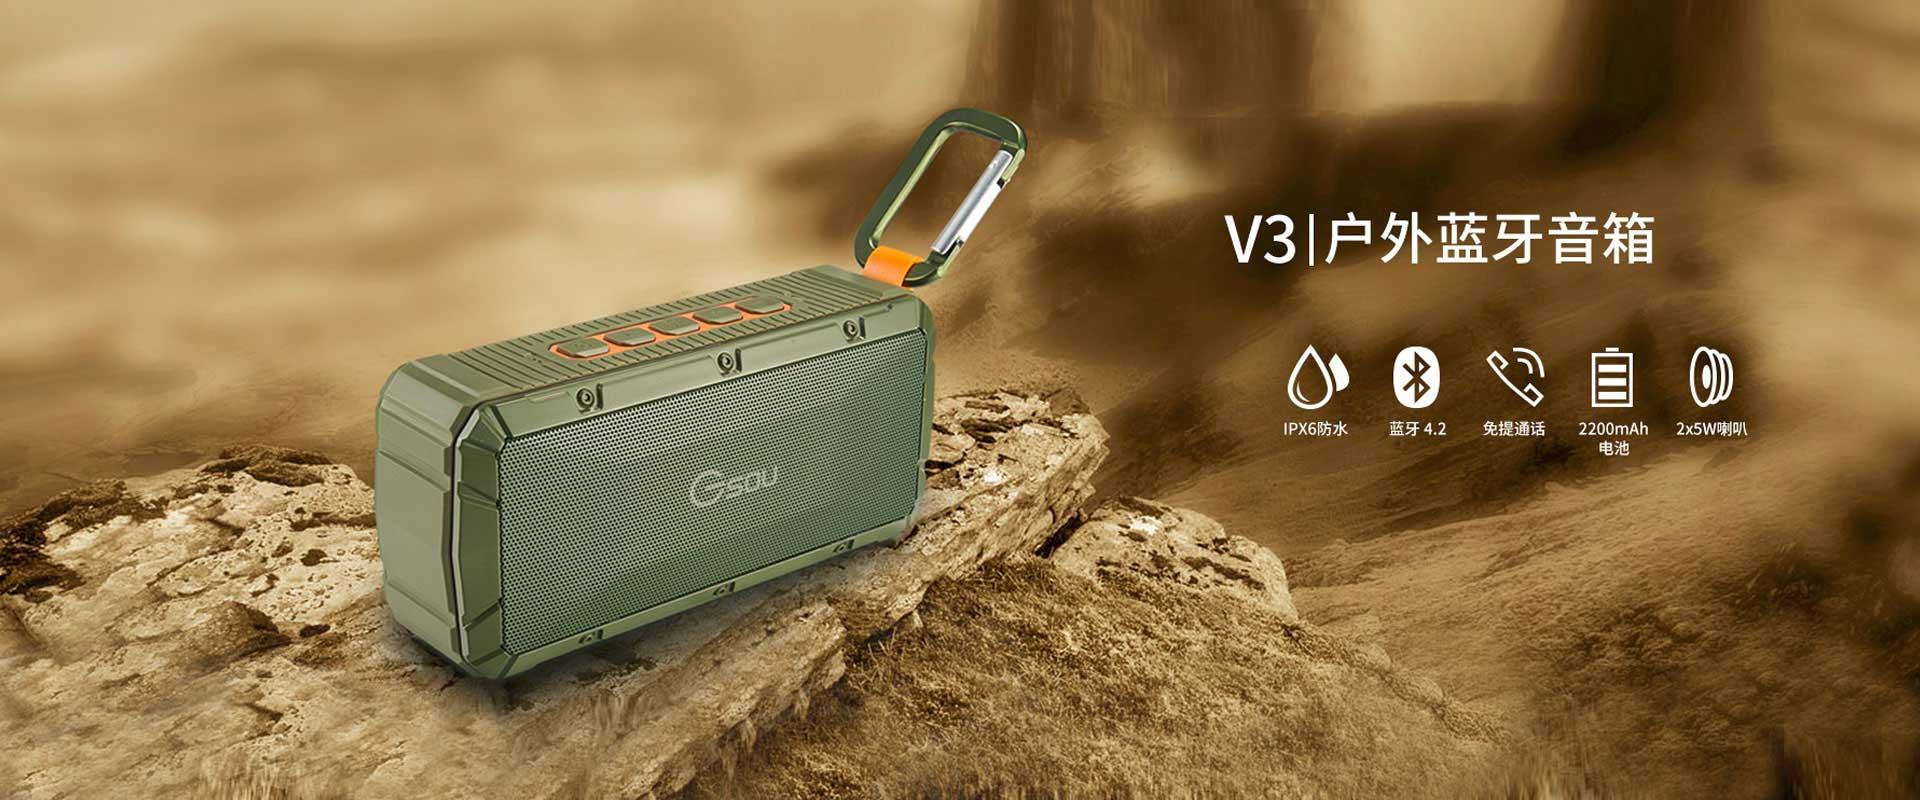 V3 便携蓝牙音箱